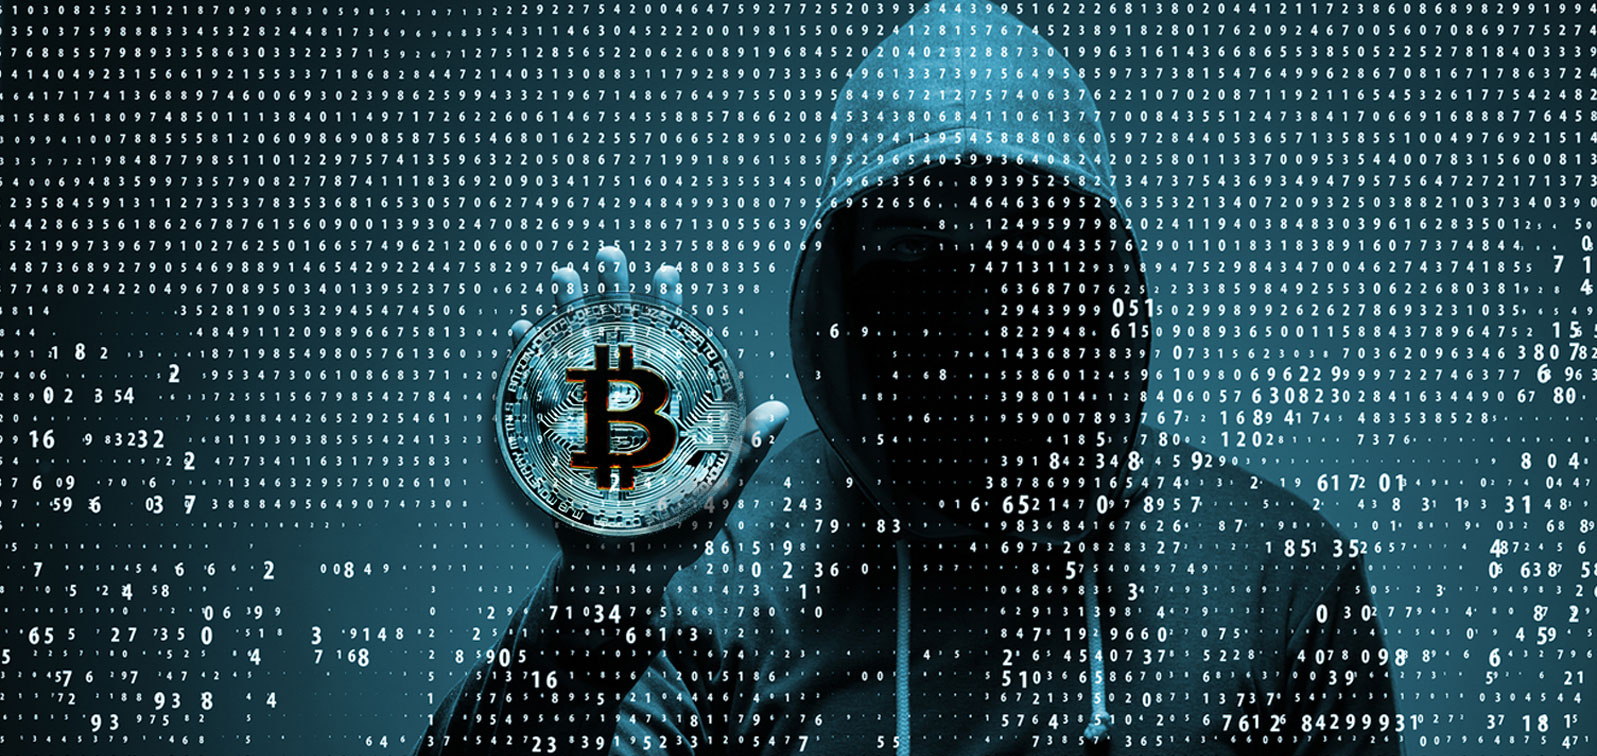 satoshi donemine ait bitcoinler harekete gecti